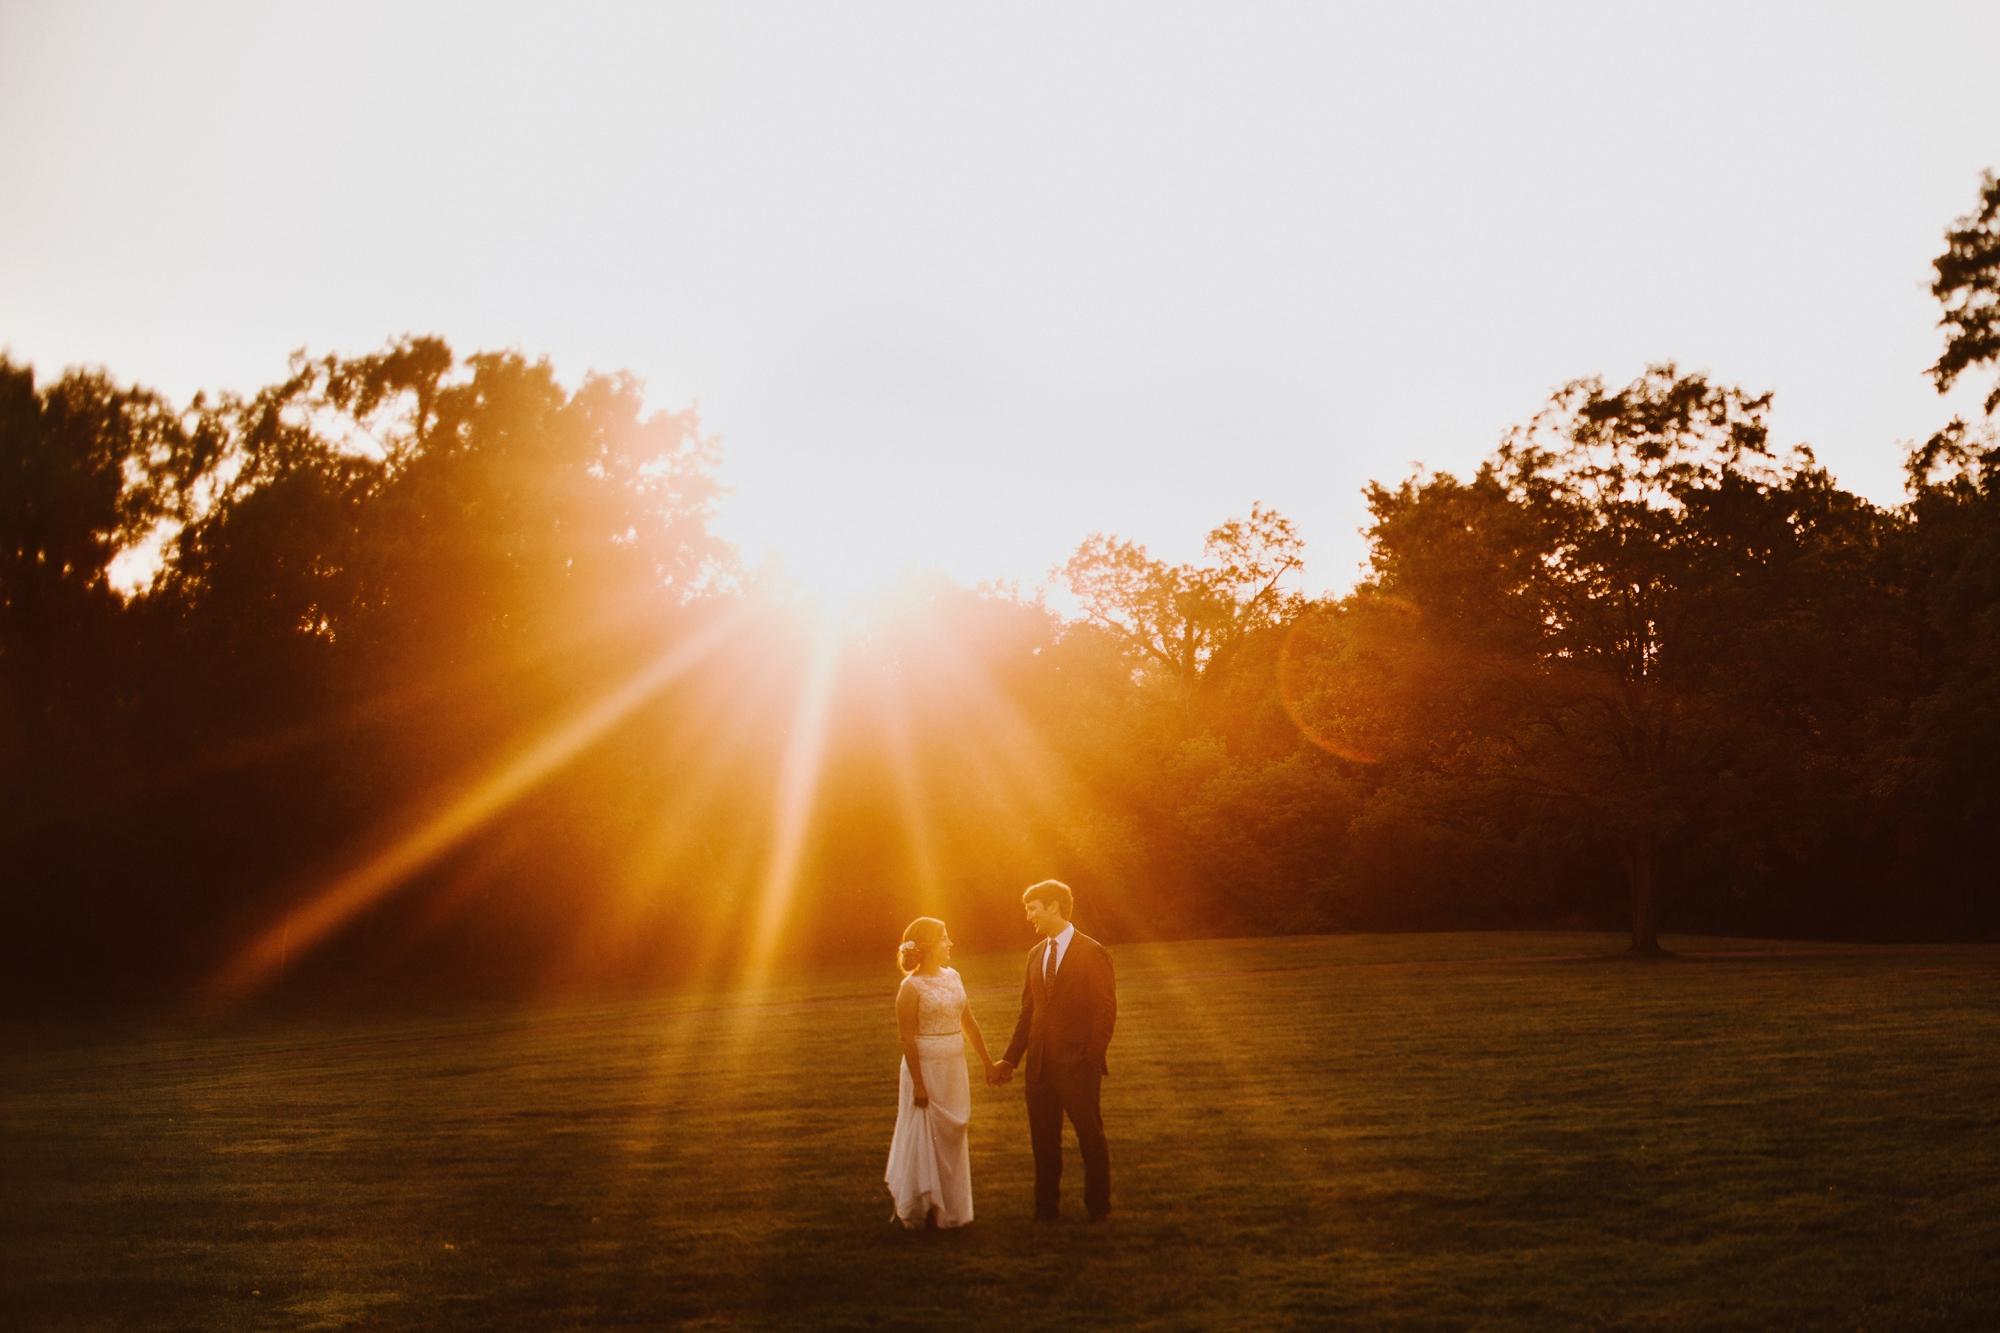 Maryland wedding photographer educational blog post | camera gear bag | canon tilt shift lenses for wedding photography